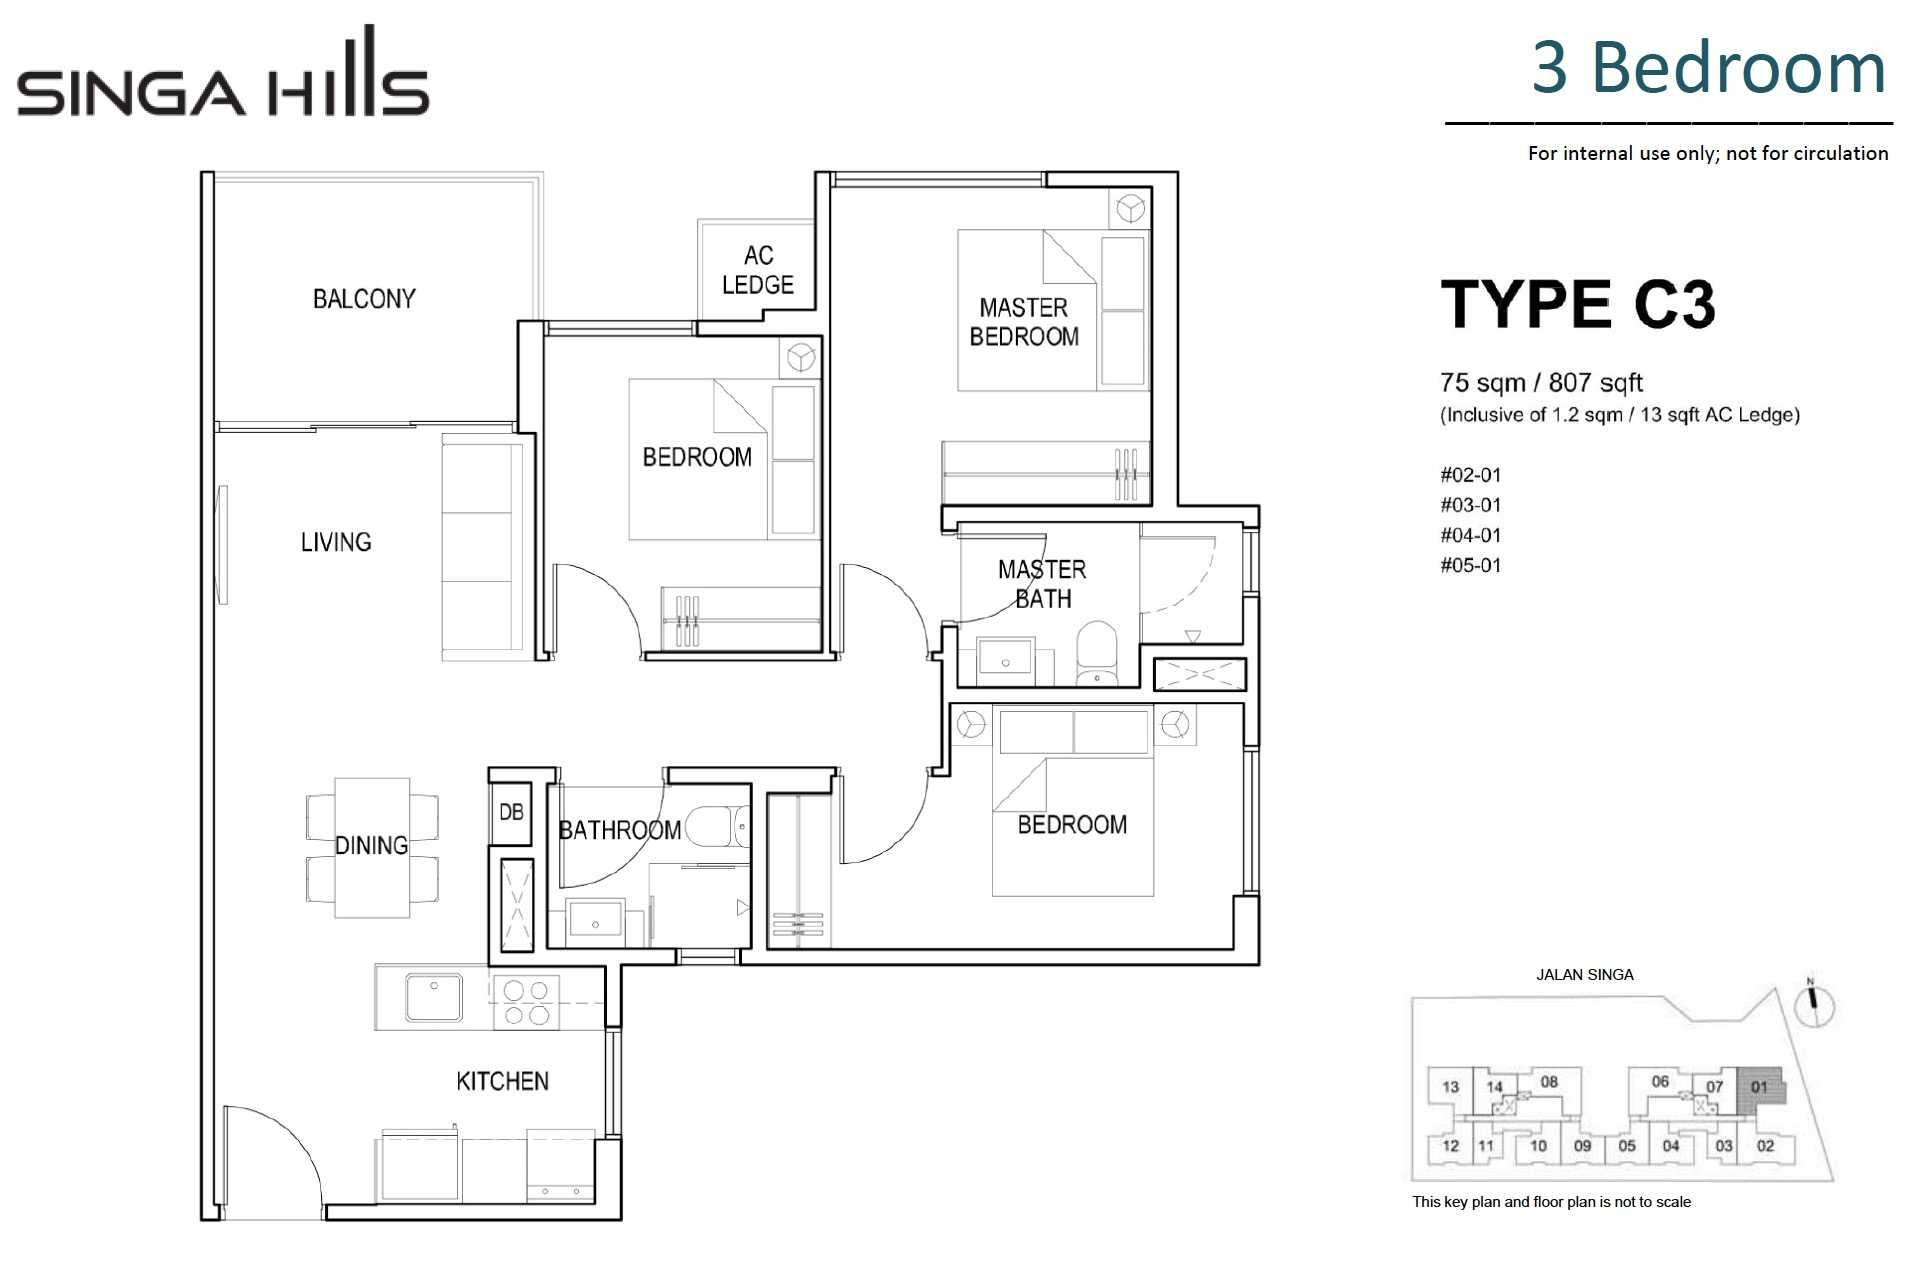 singa-hills-floor-plan-3BR-C3